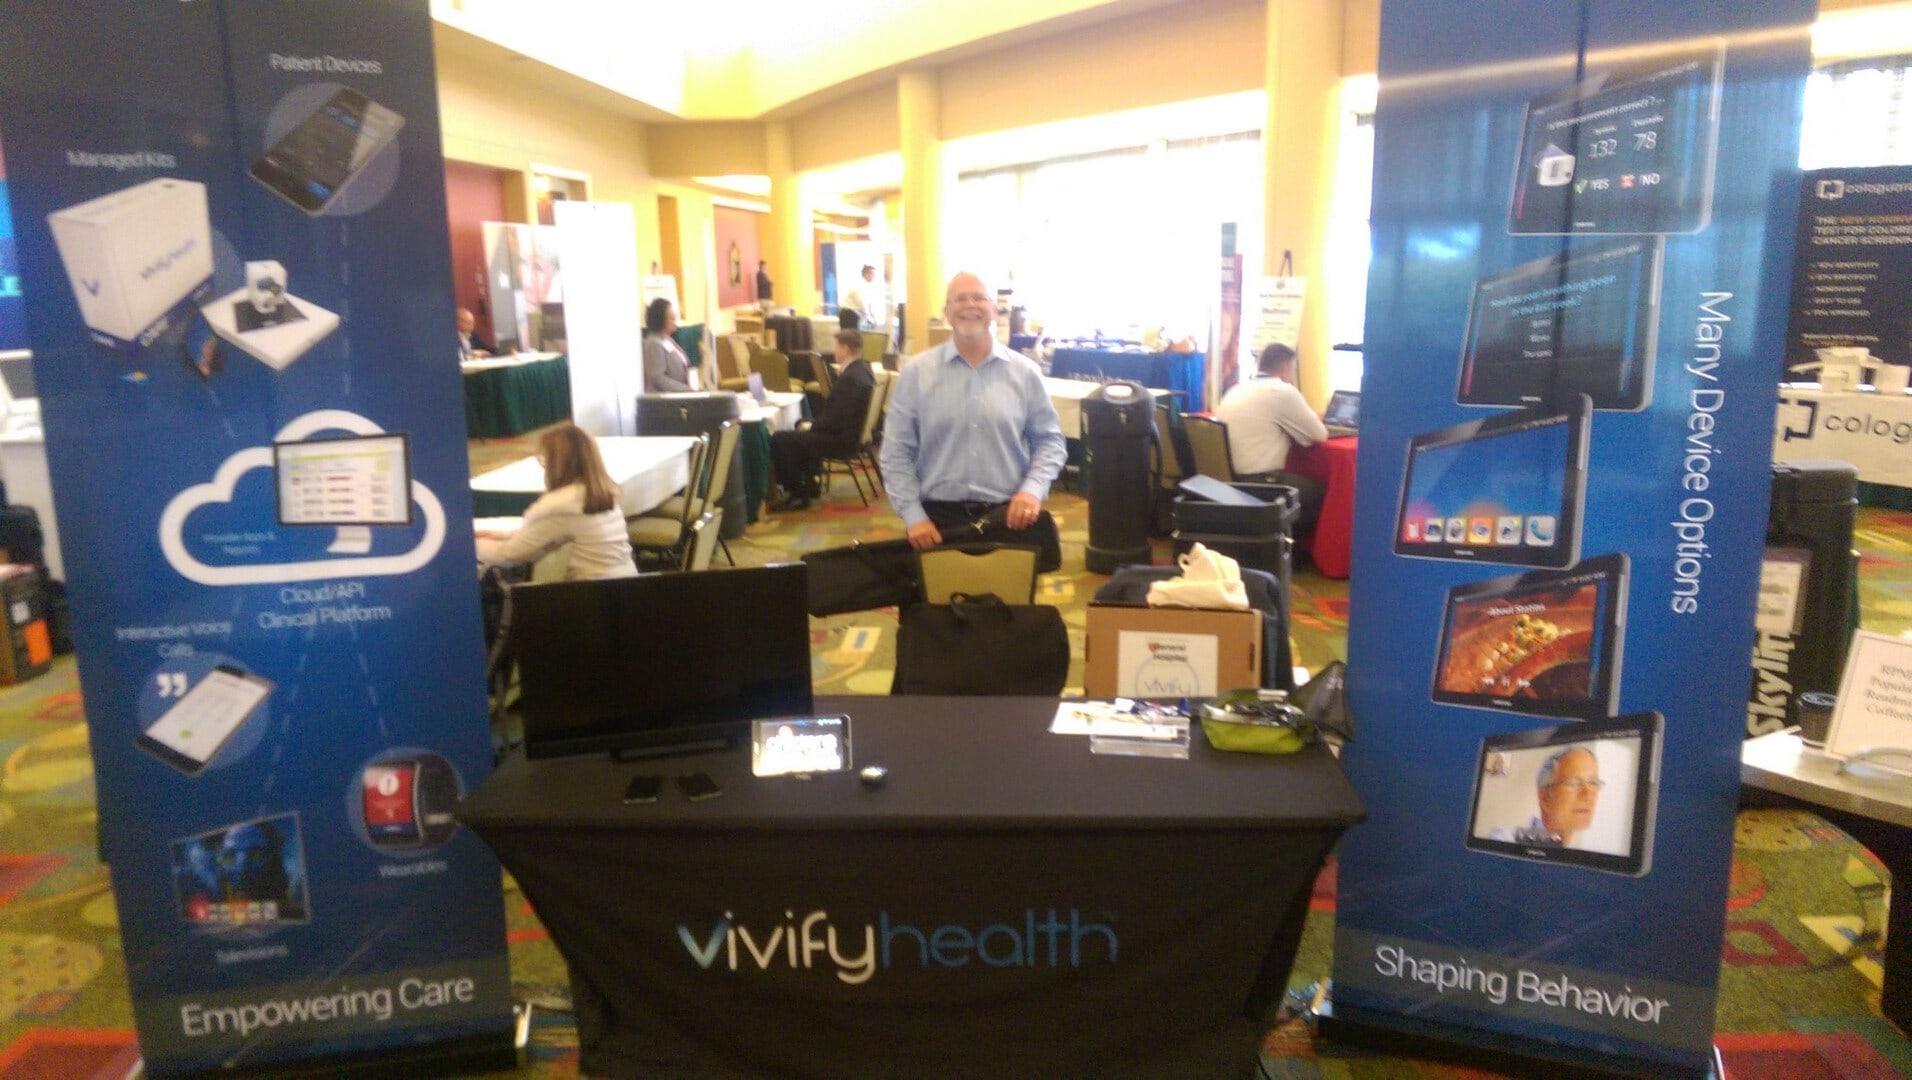 @VivifyHealth is representing at the @Wrldhealthcare Summit in Atlanta today through Friday. #telehealth #mhealth